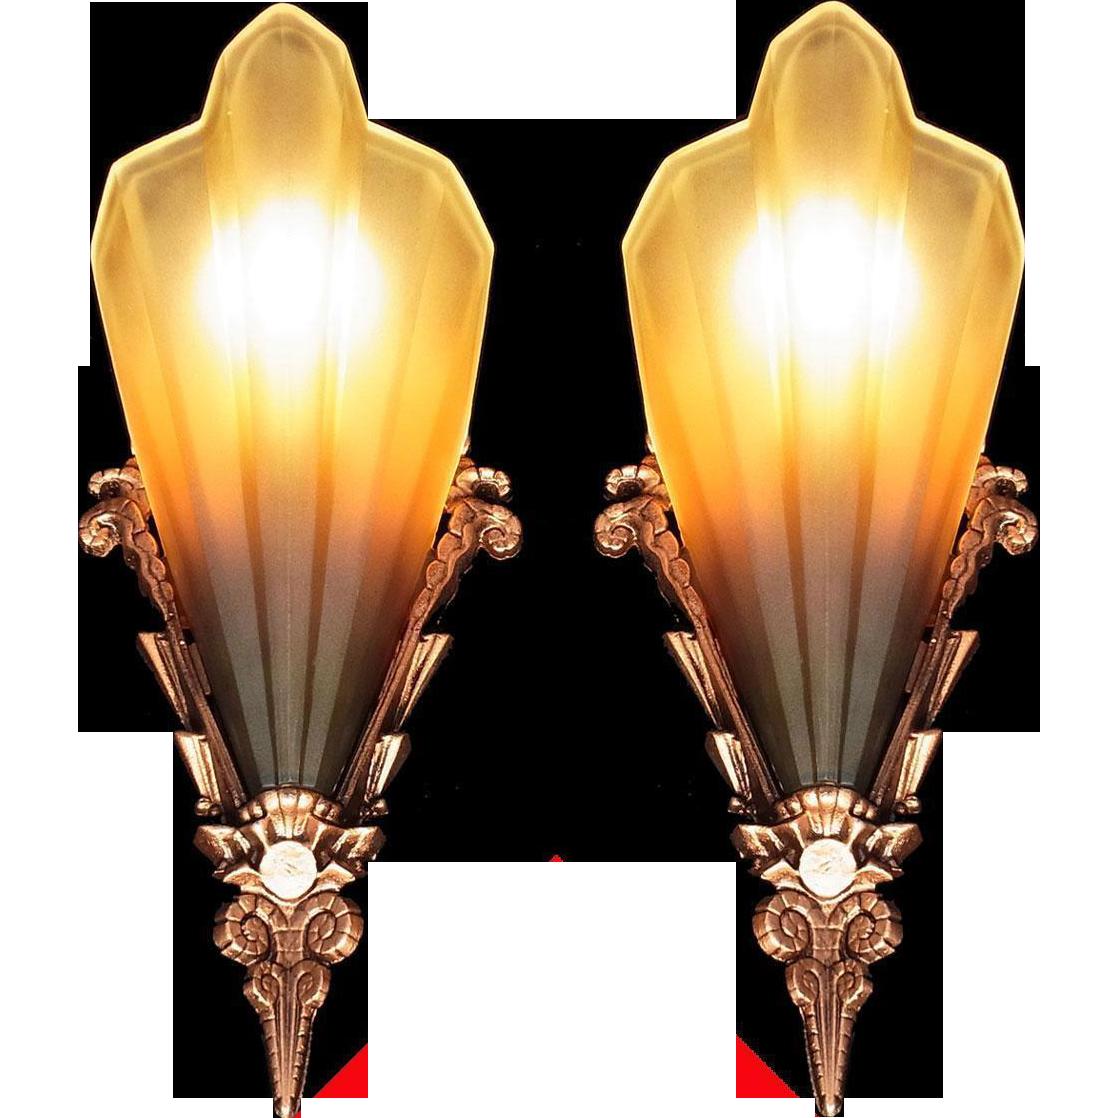 American Art Deco 'Soleure' Brown Tip Honey Glass Slip Shade Sconce set (pair) Chandelier original 1930s